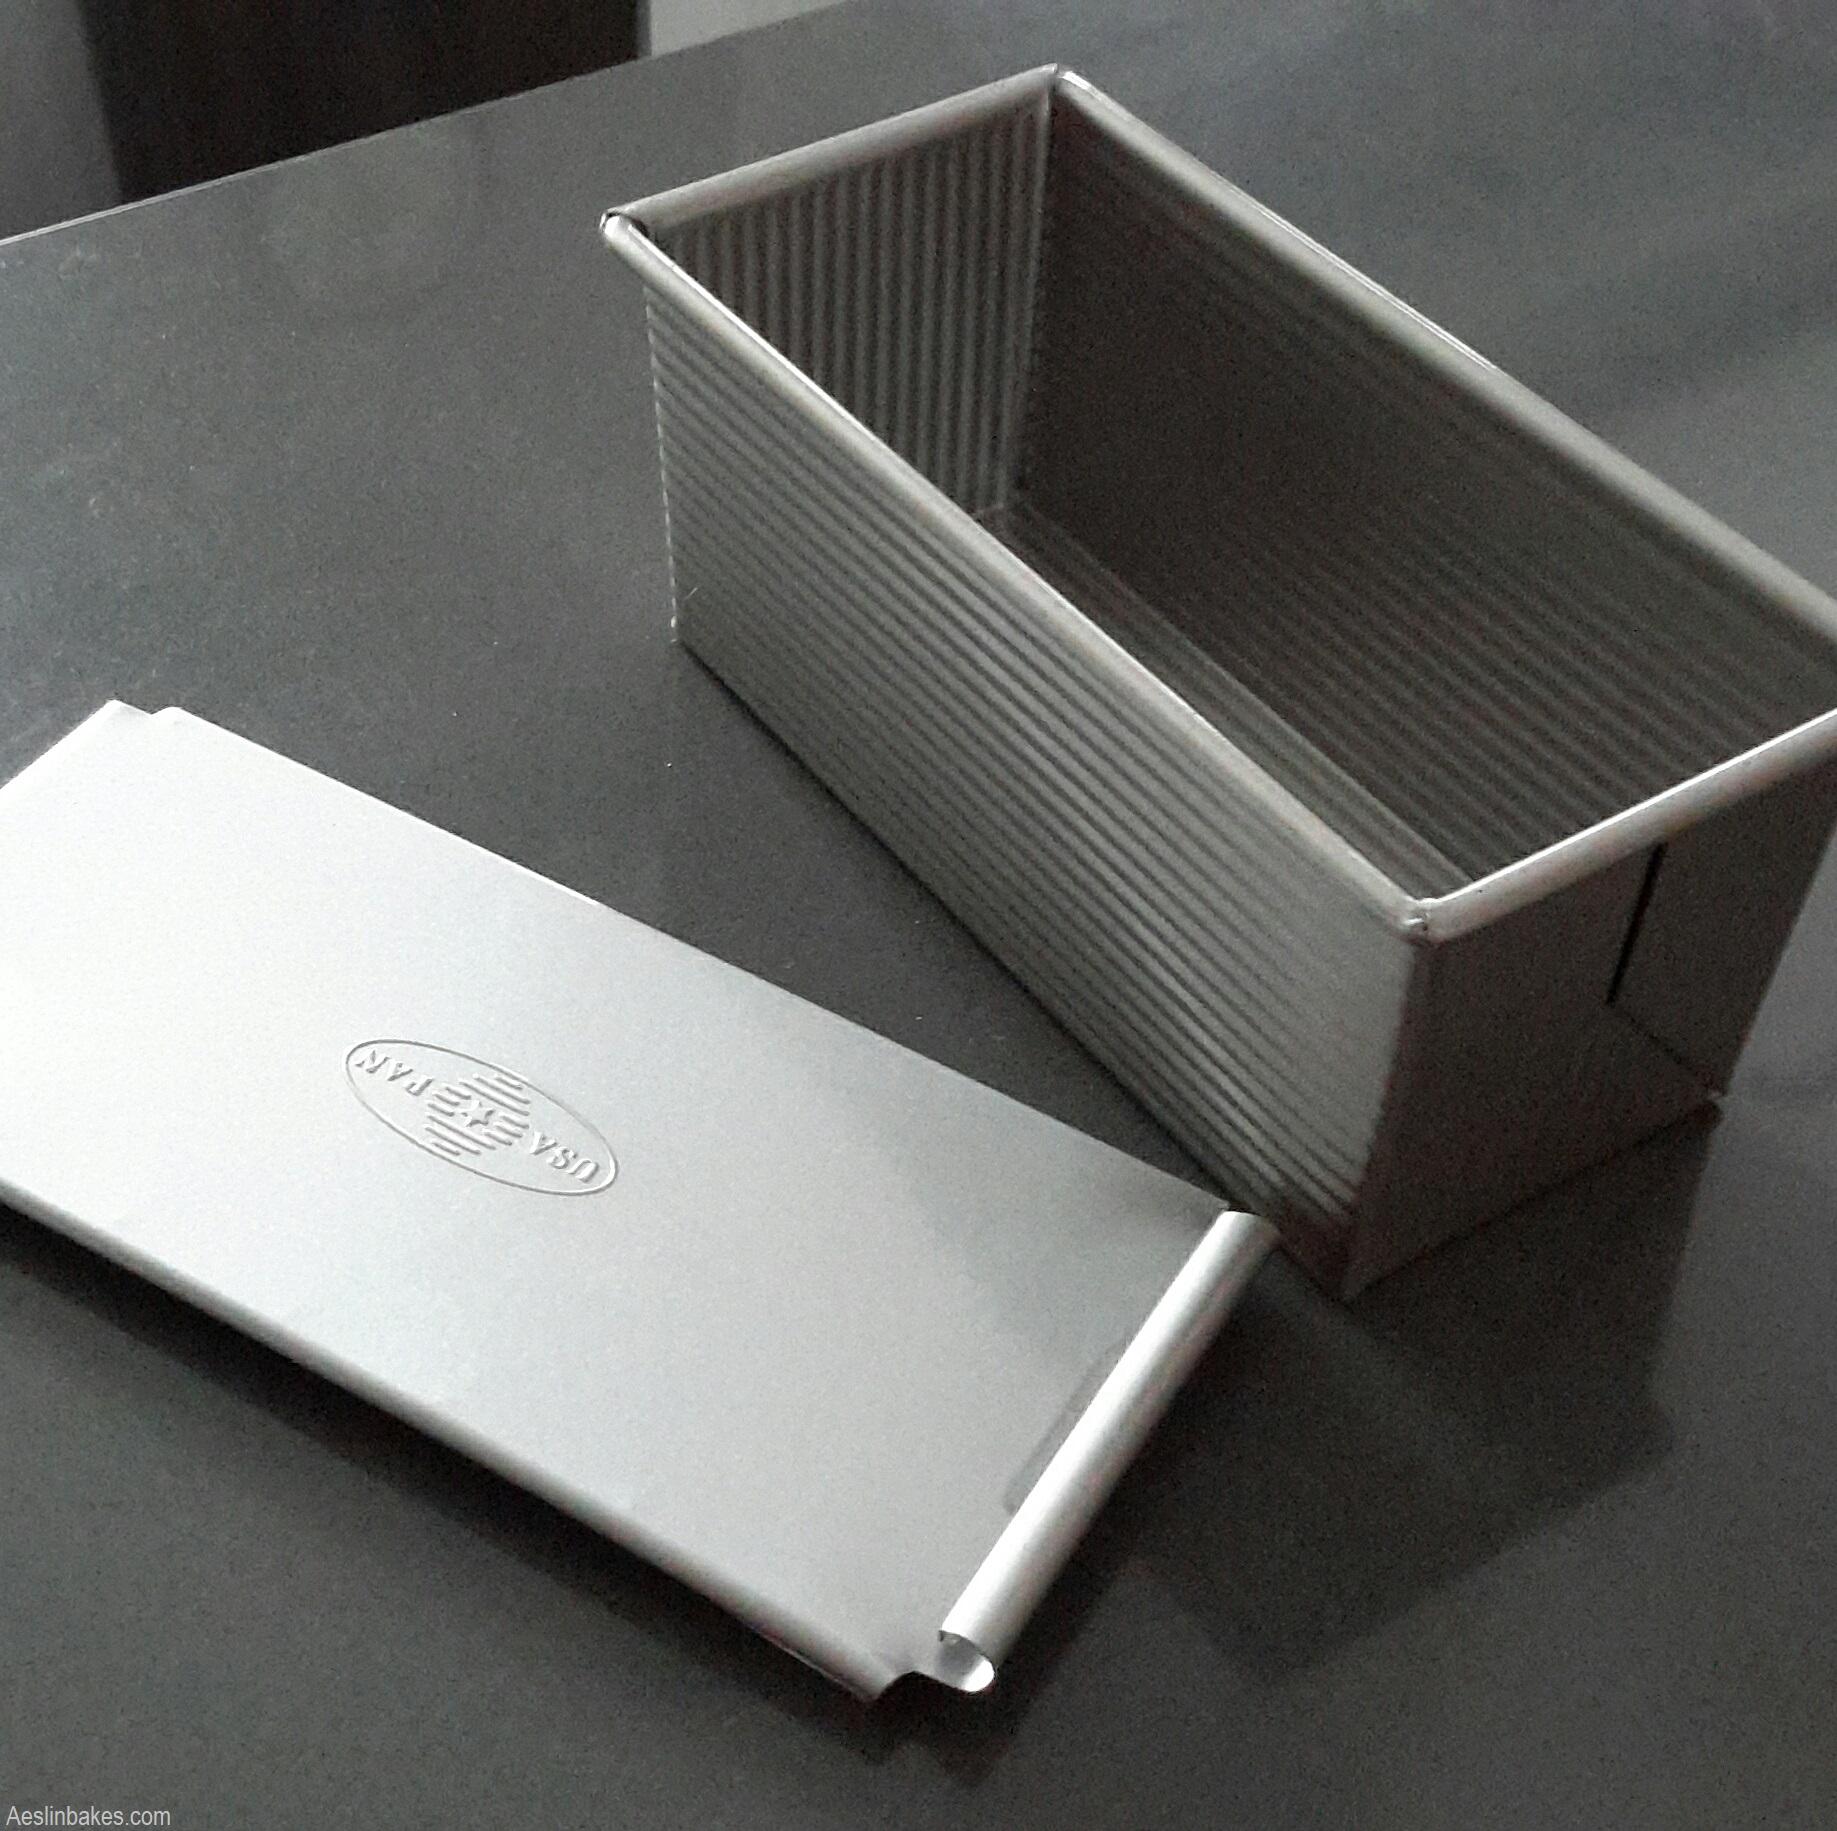 9x4-inch Pullman pan